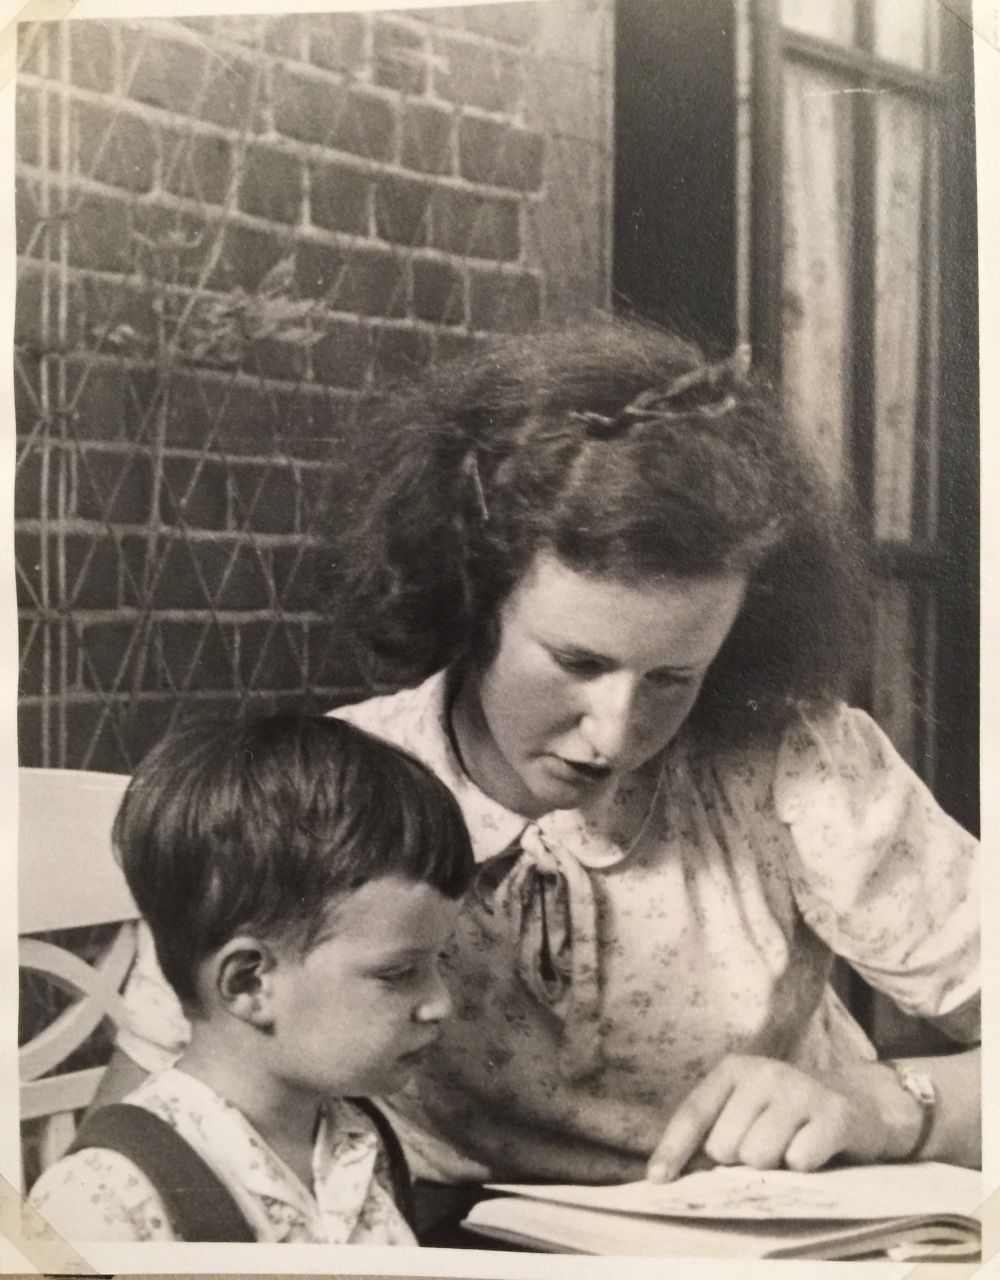 Rita Aged 15 - 1944